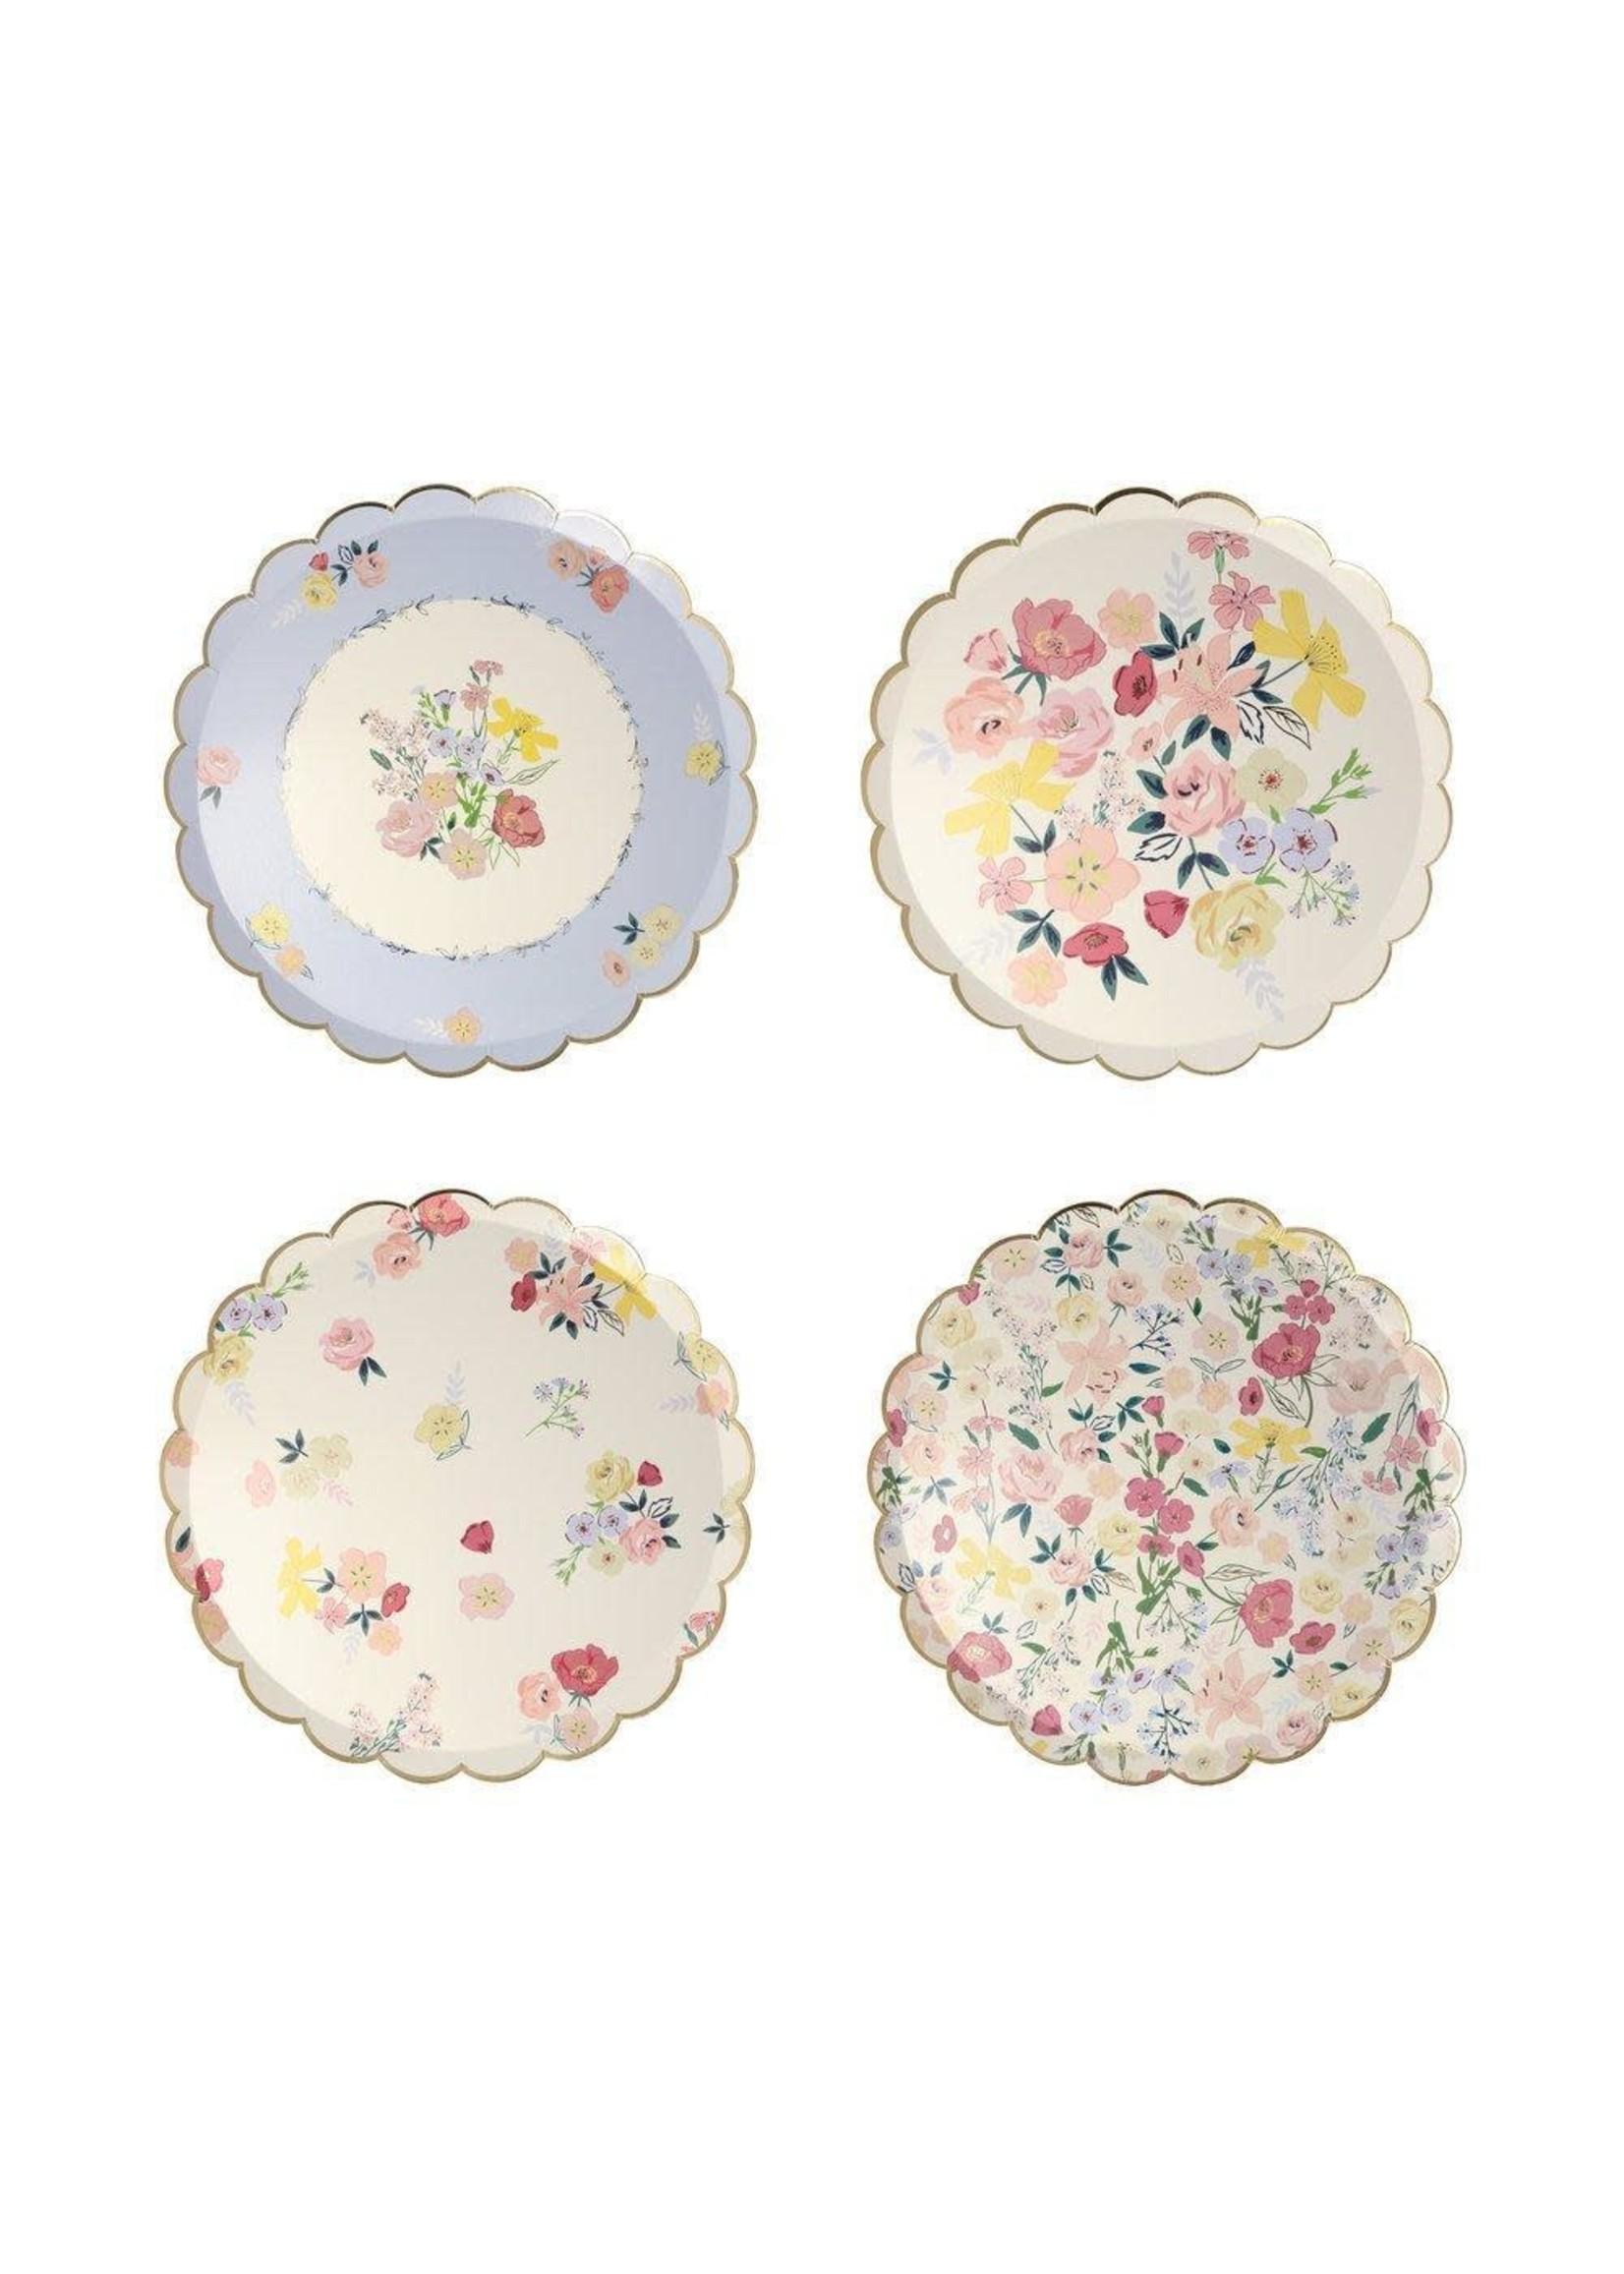 Meri Meri Paper Side Plates - English Garden